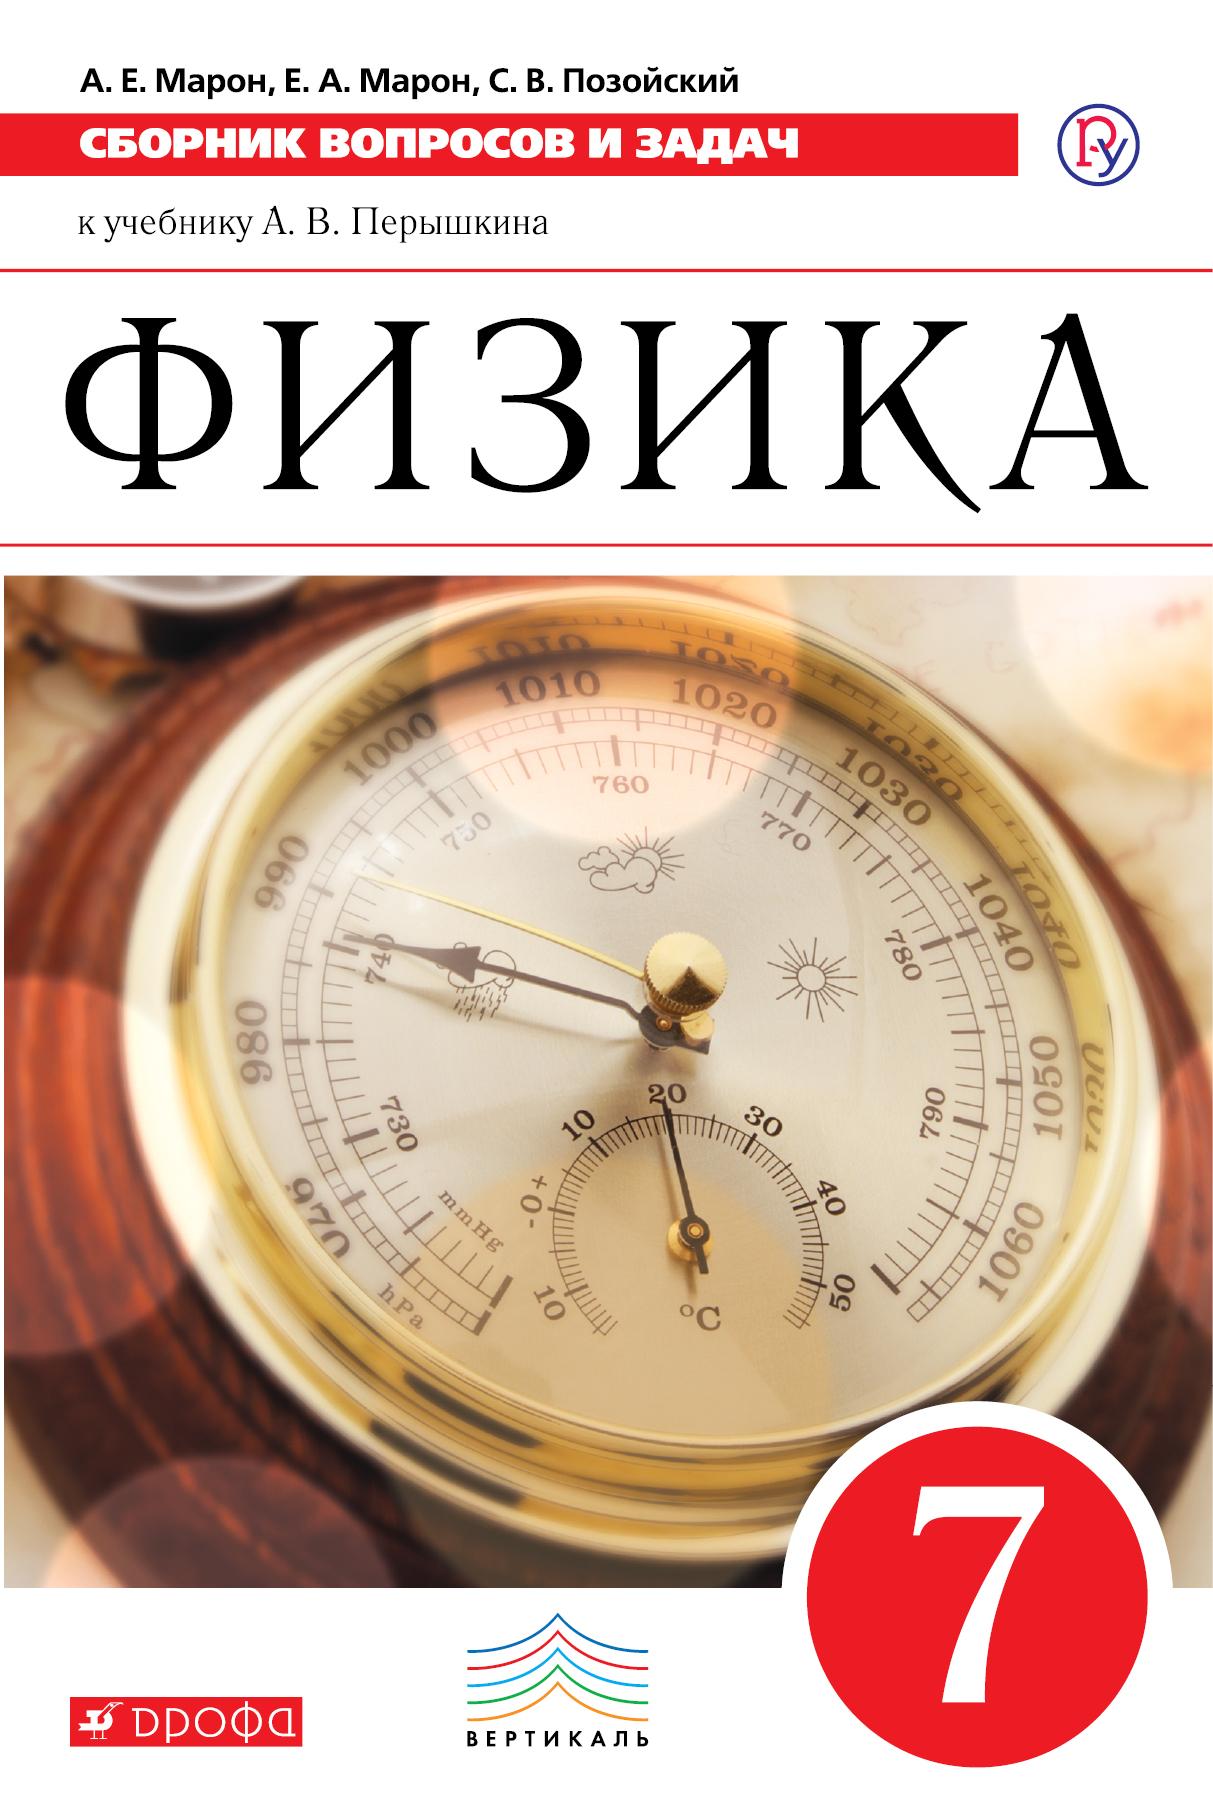 Физика. Сборник вопросов и задач. 7 класс от book24.ru